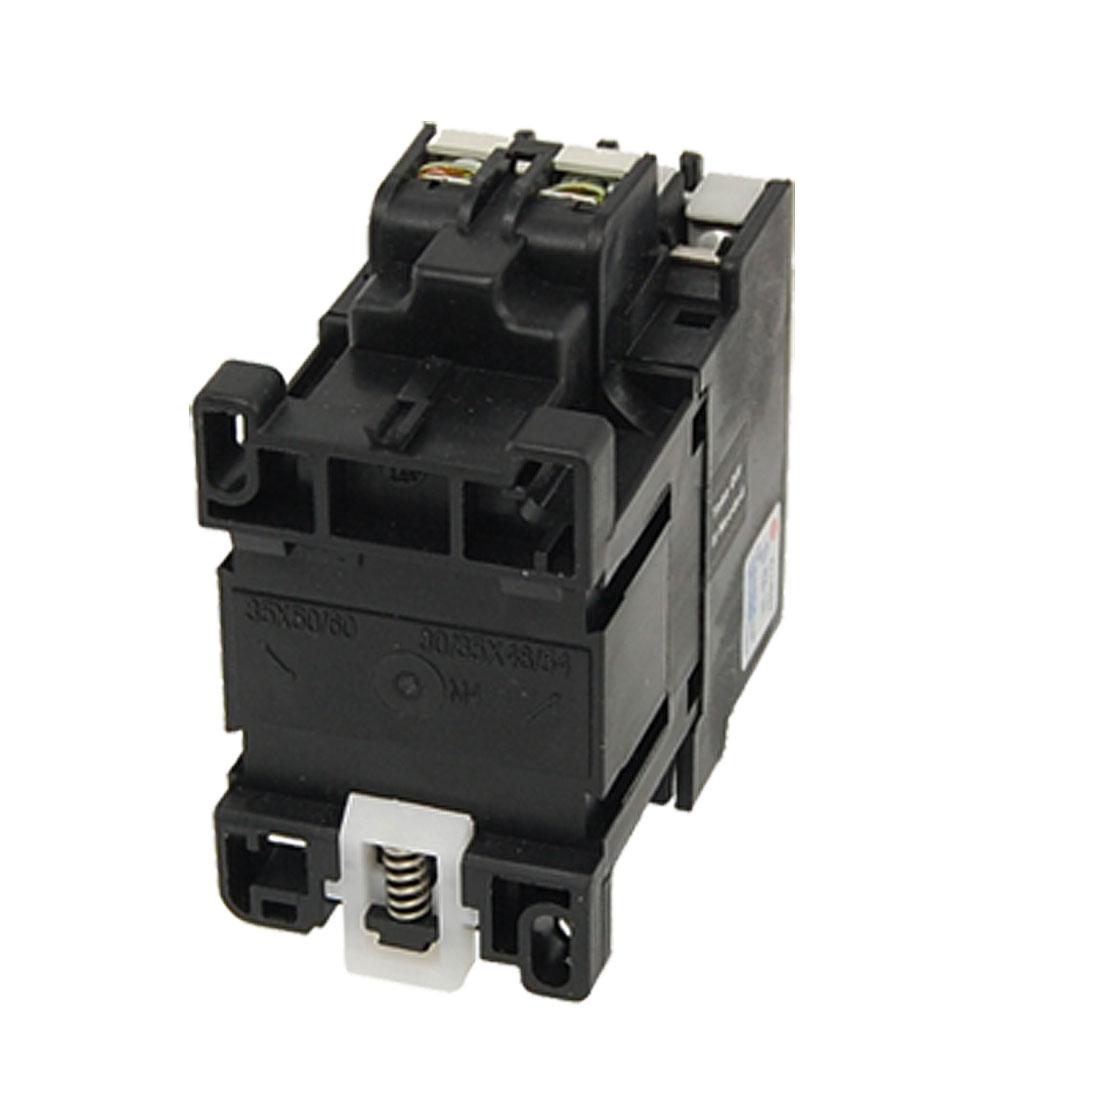 S-P11 11A 200-220V Coil 50/60Hz 3-phase Poles 1NO AC Contactor